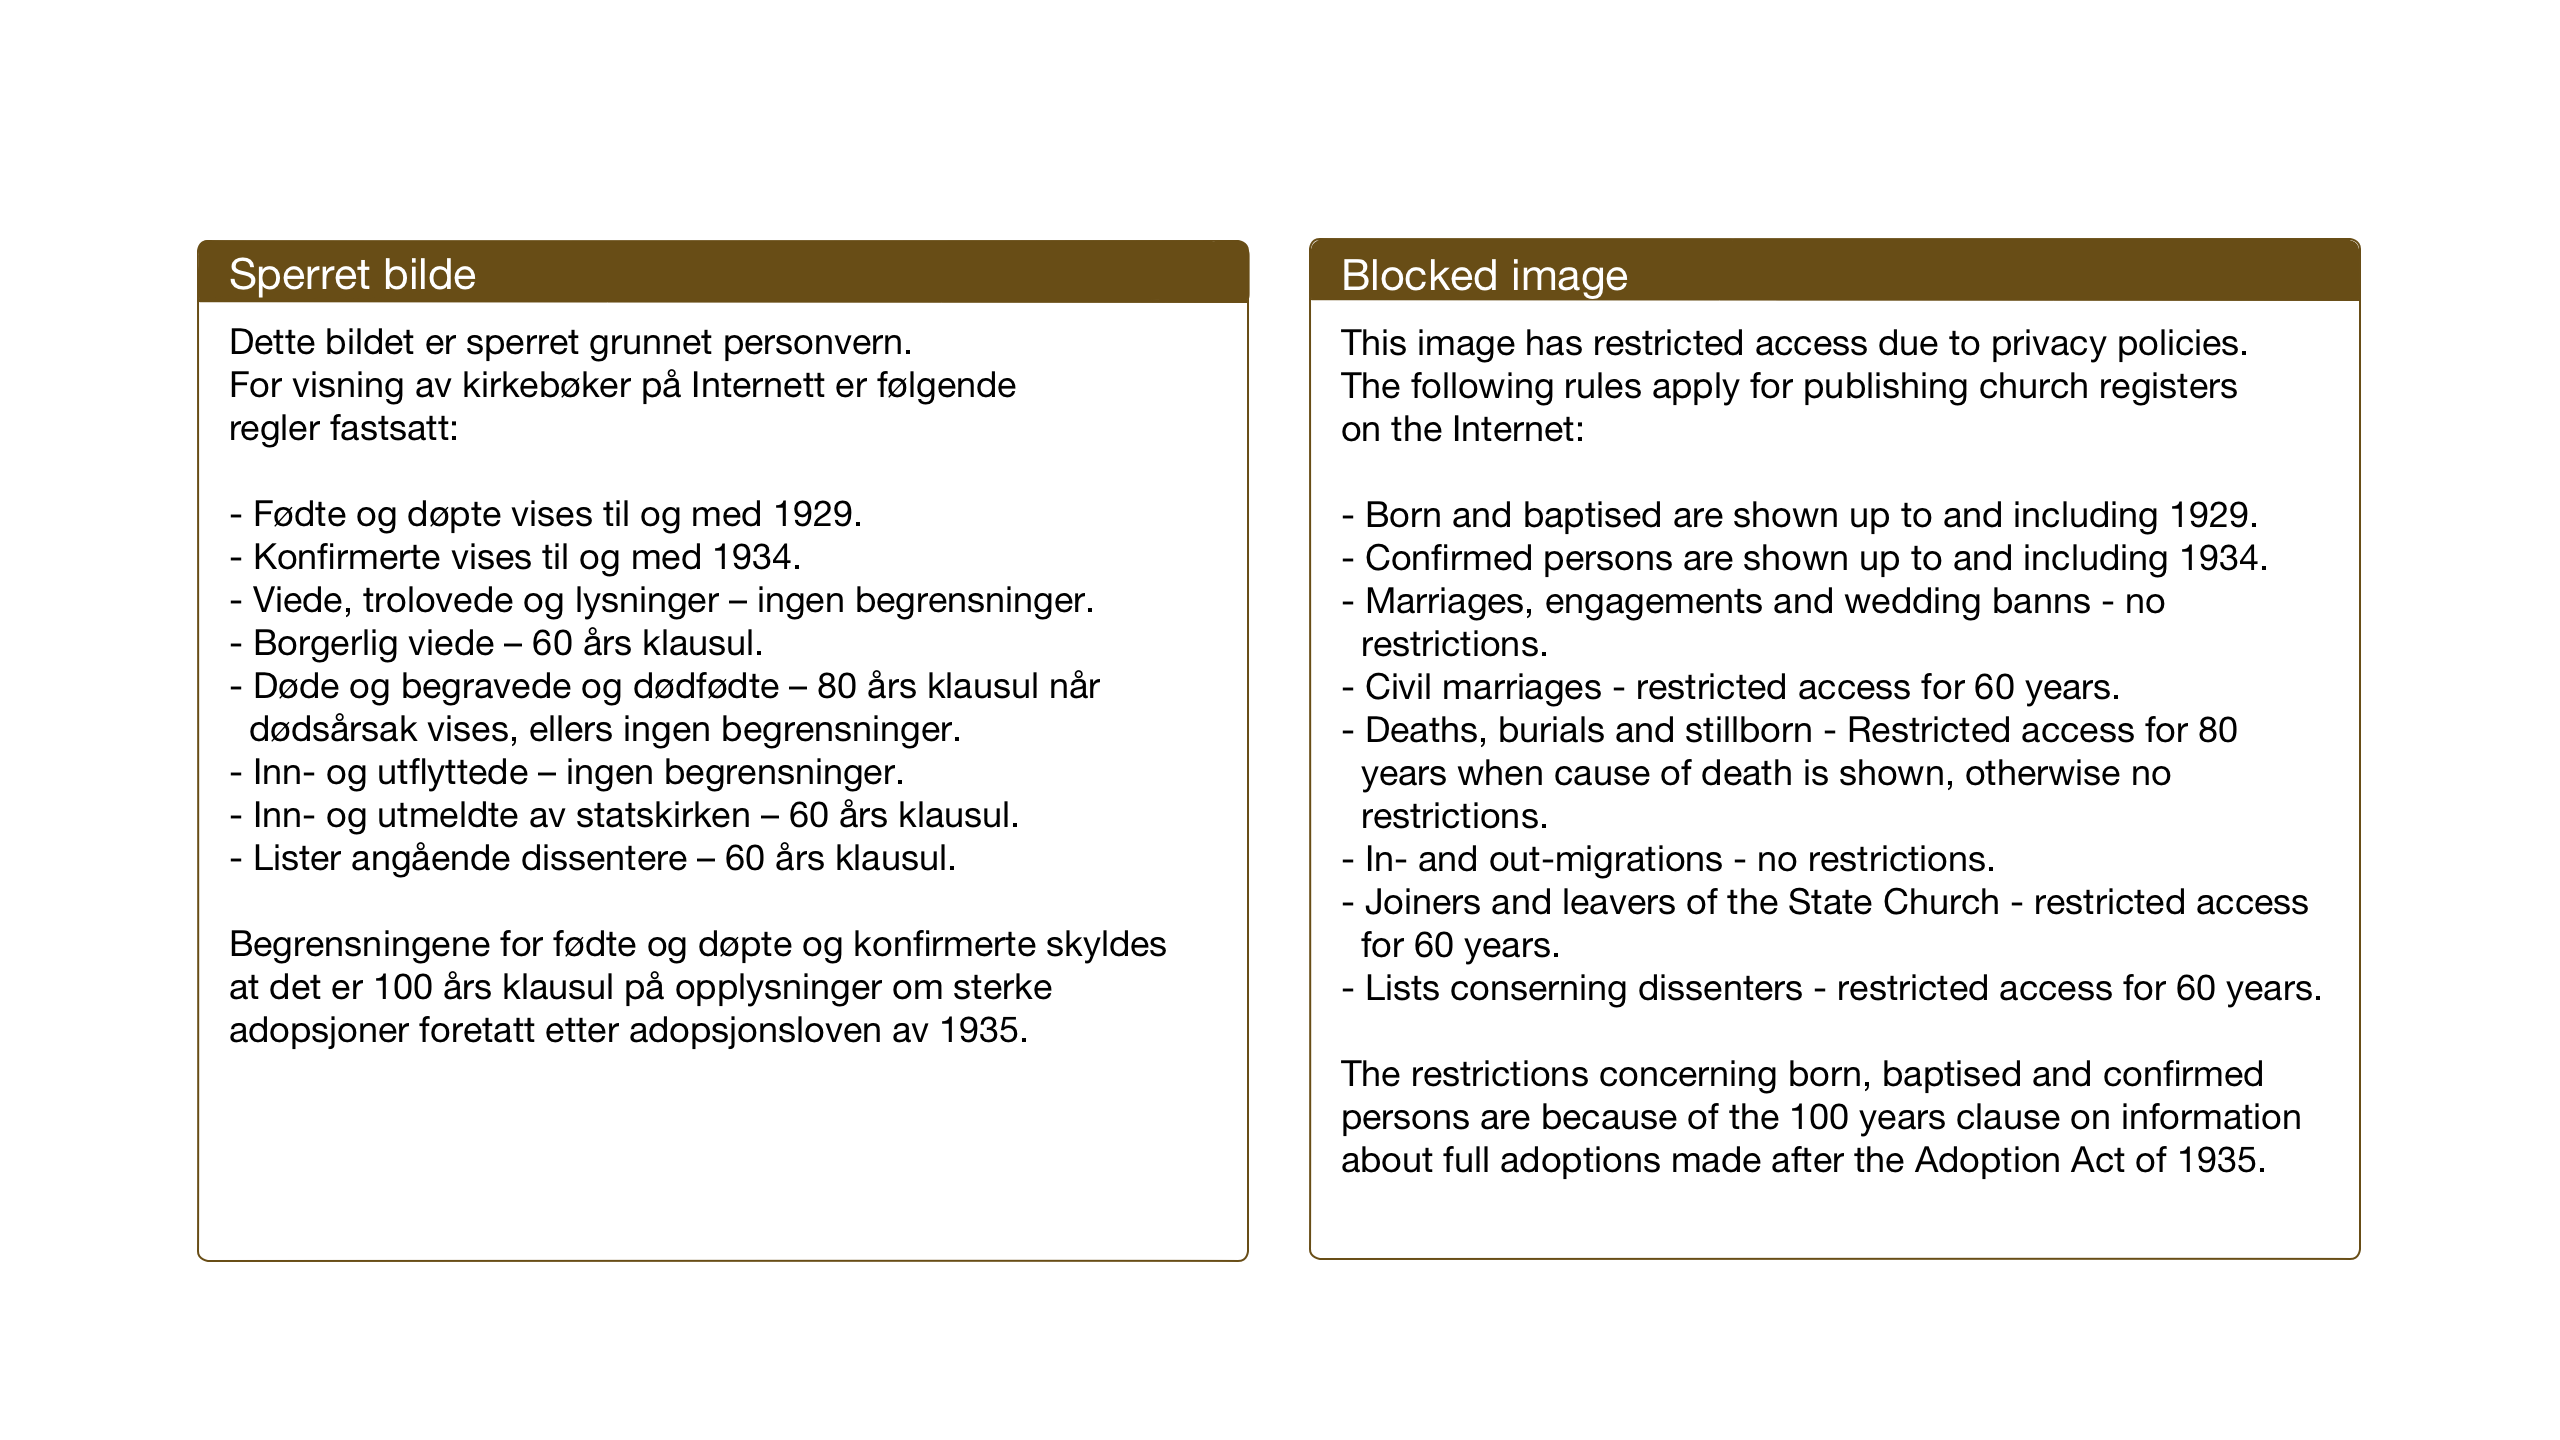 SAB, Domkirken Sokneprestembete, H/Haa: Ministerialbok nr. C 9, 1958-2001, s. 20b-21a